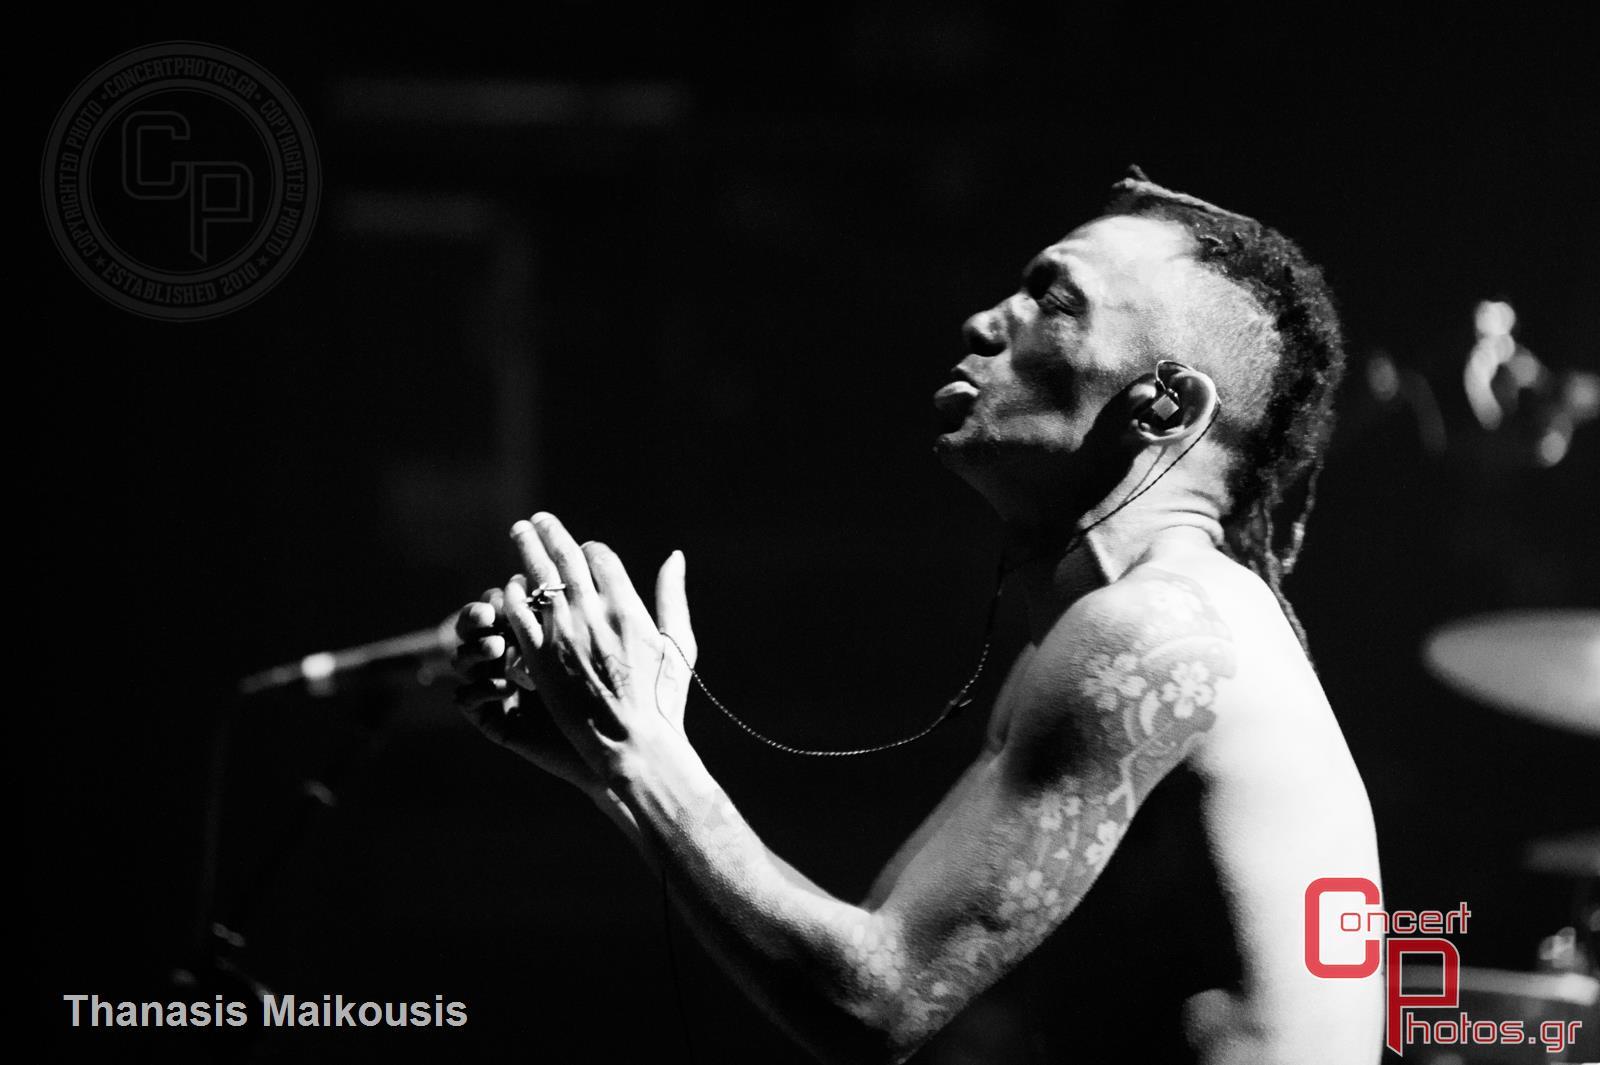 Tricky - Spectralfire-Tricky - Spectralfire photographer: Thanasis Maikousis - concertphotos_-3854